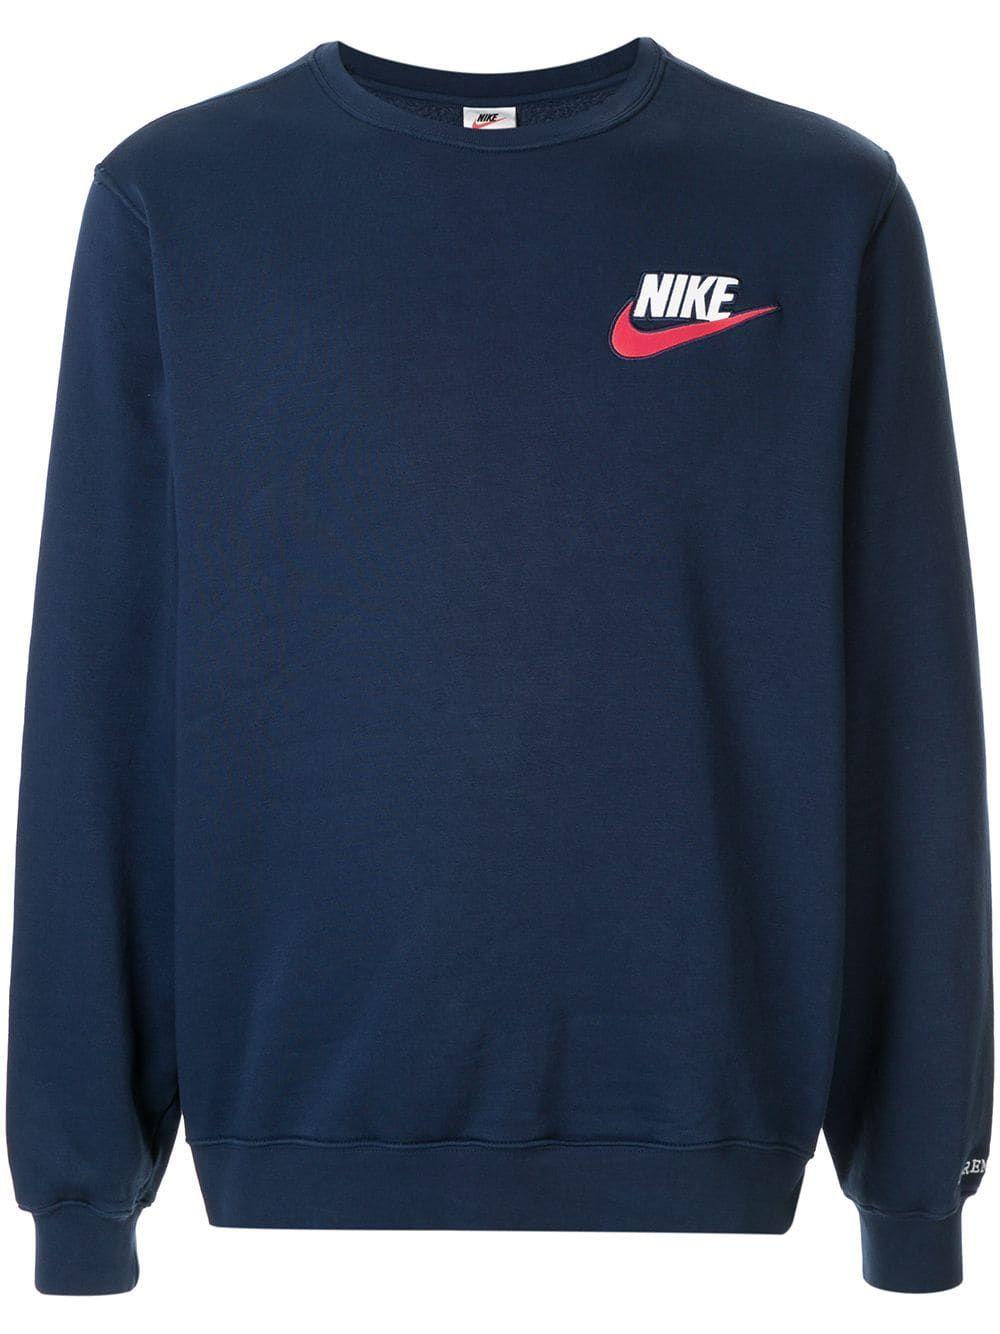 Supreme Nike Crew Neck Sweatshirt Farfetch Sweatshirts Nike Crewneck Sweatshirt Crew Neck Sweatshirt [ 1334 x 1000 Pixel ]